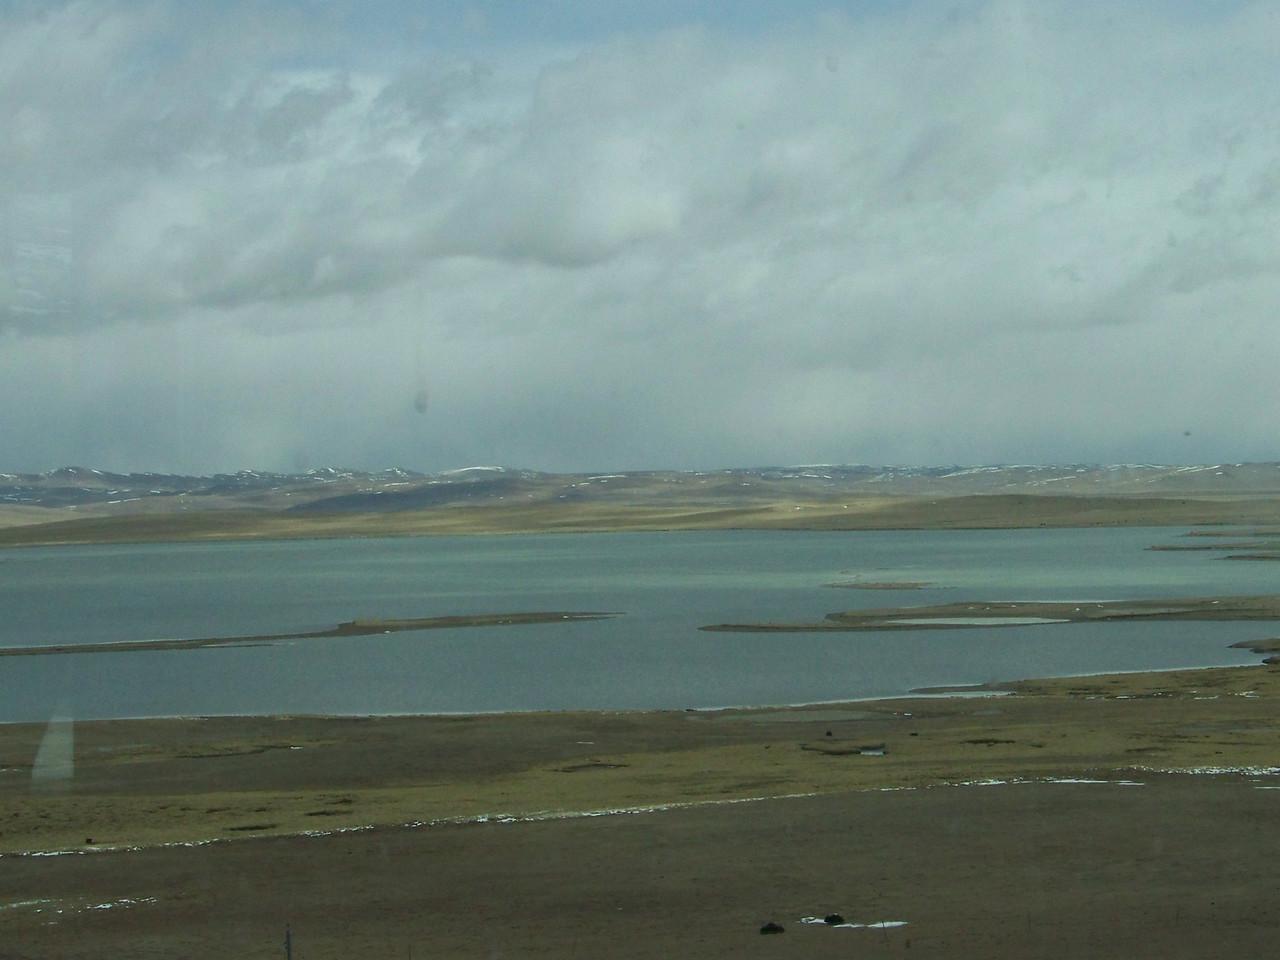 0109 - Scenery on Train Trip Between Beijing and Lhasa.JPG